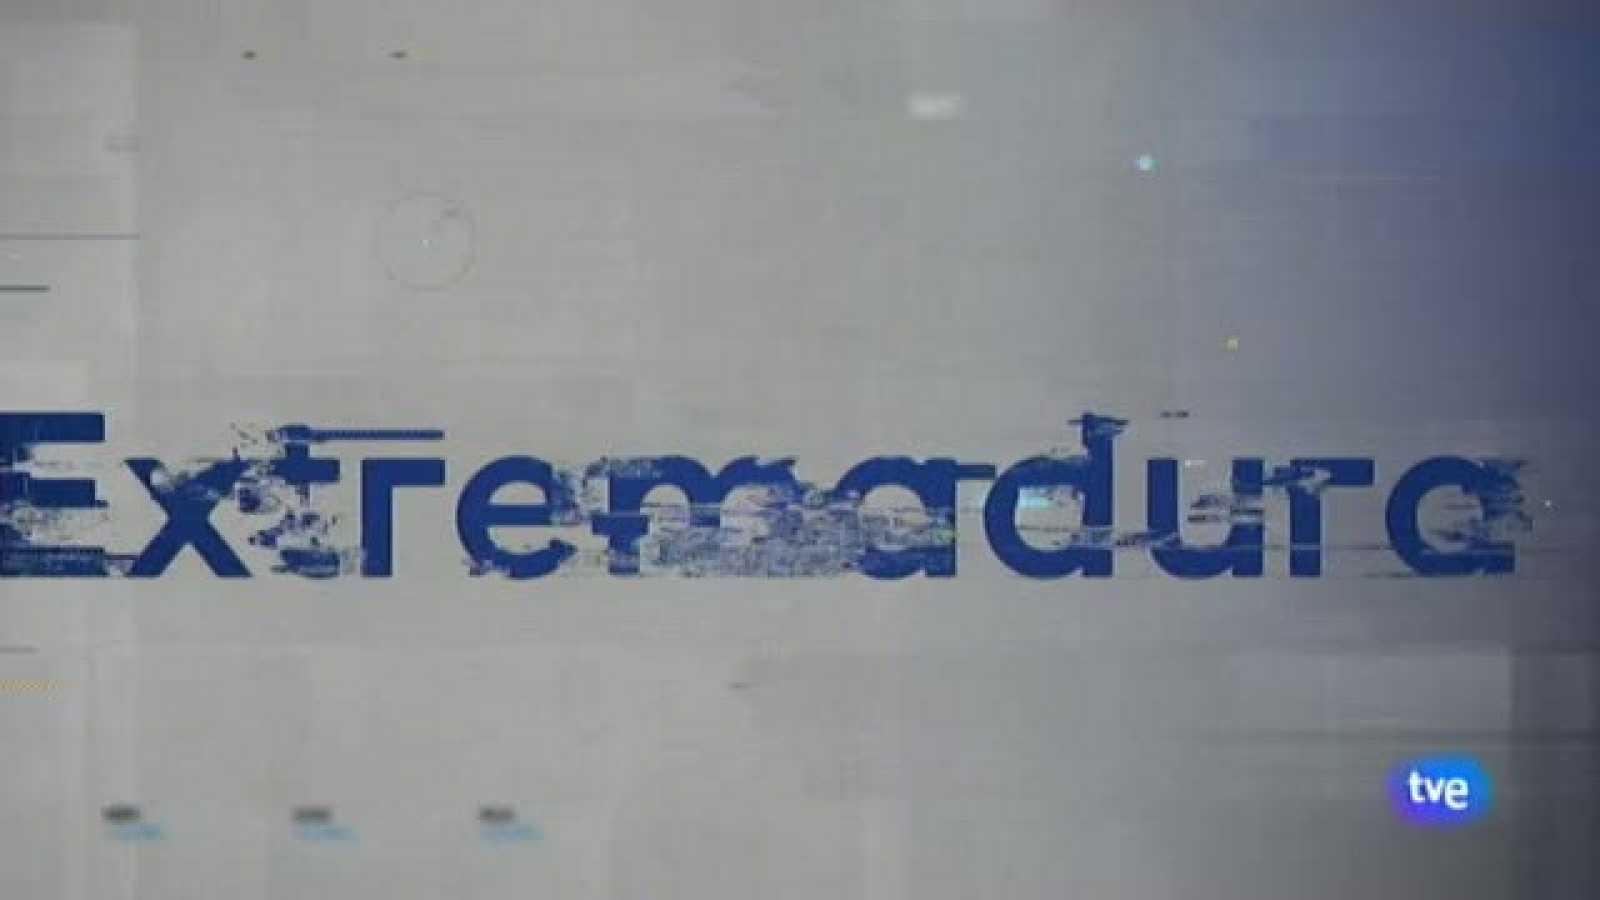 Noticias Extremadura 2 - 01/03/2021